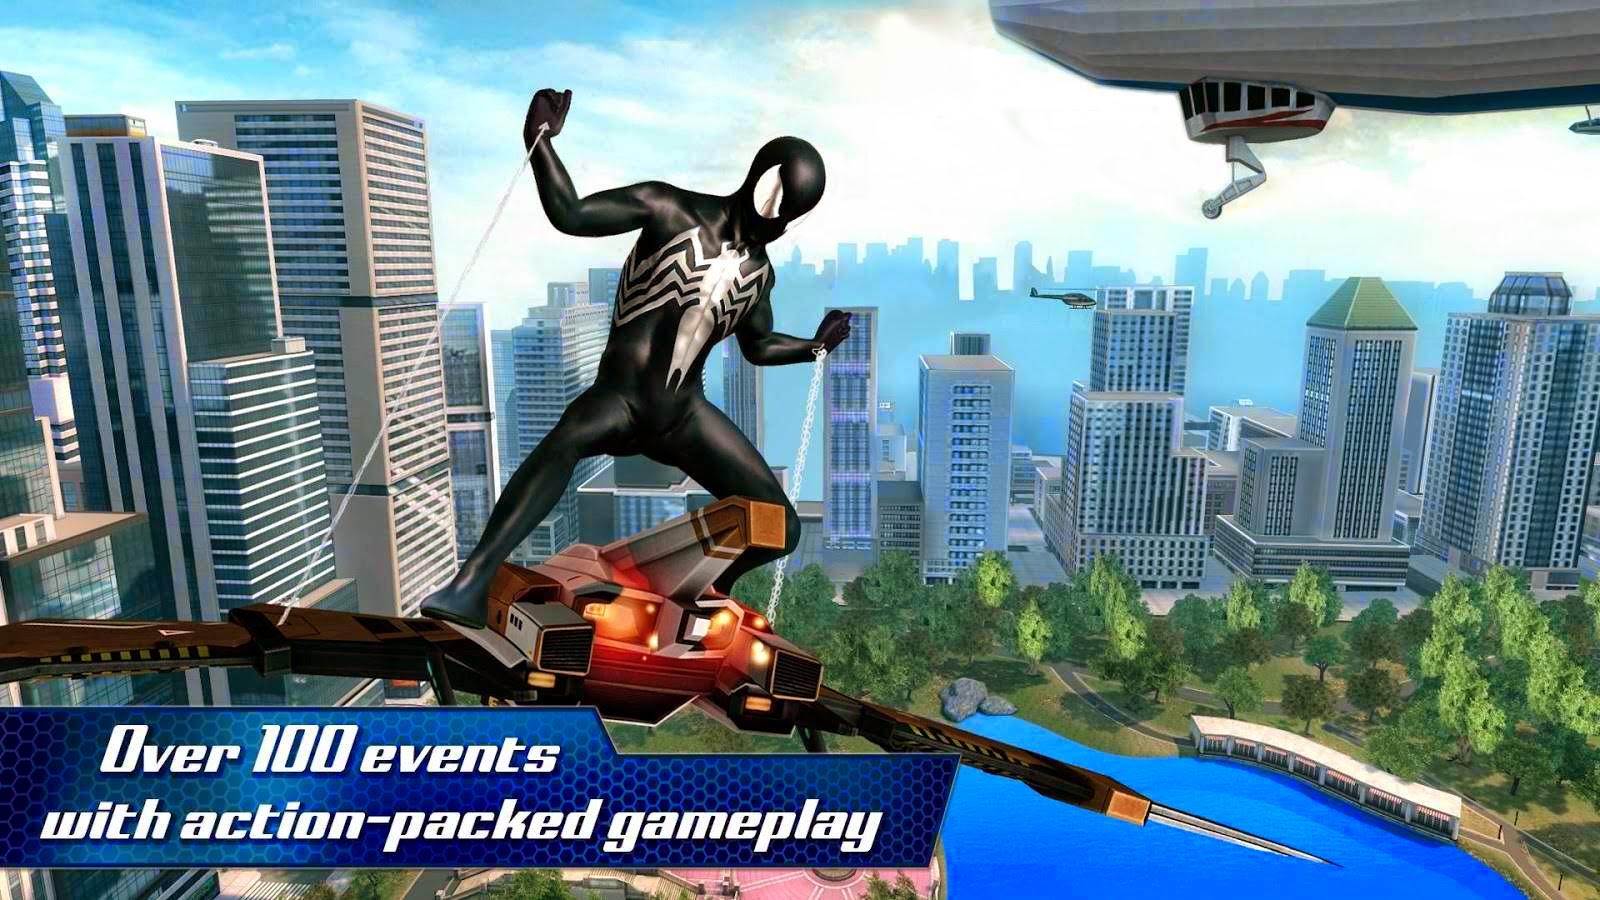 The Amazing Spider Man 2 v1.2.0m Offline Apk - Download 4 ...